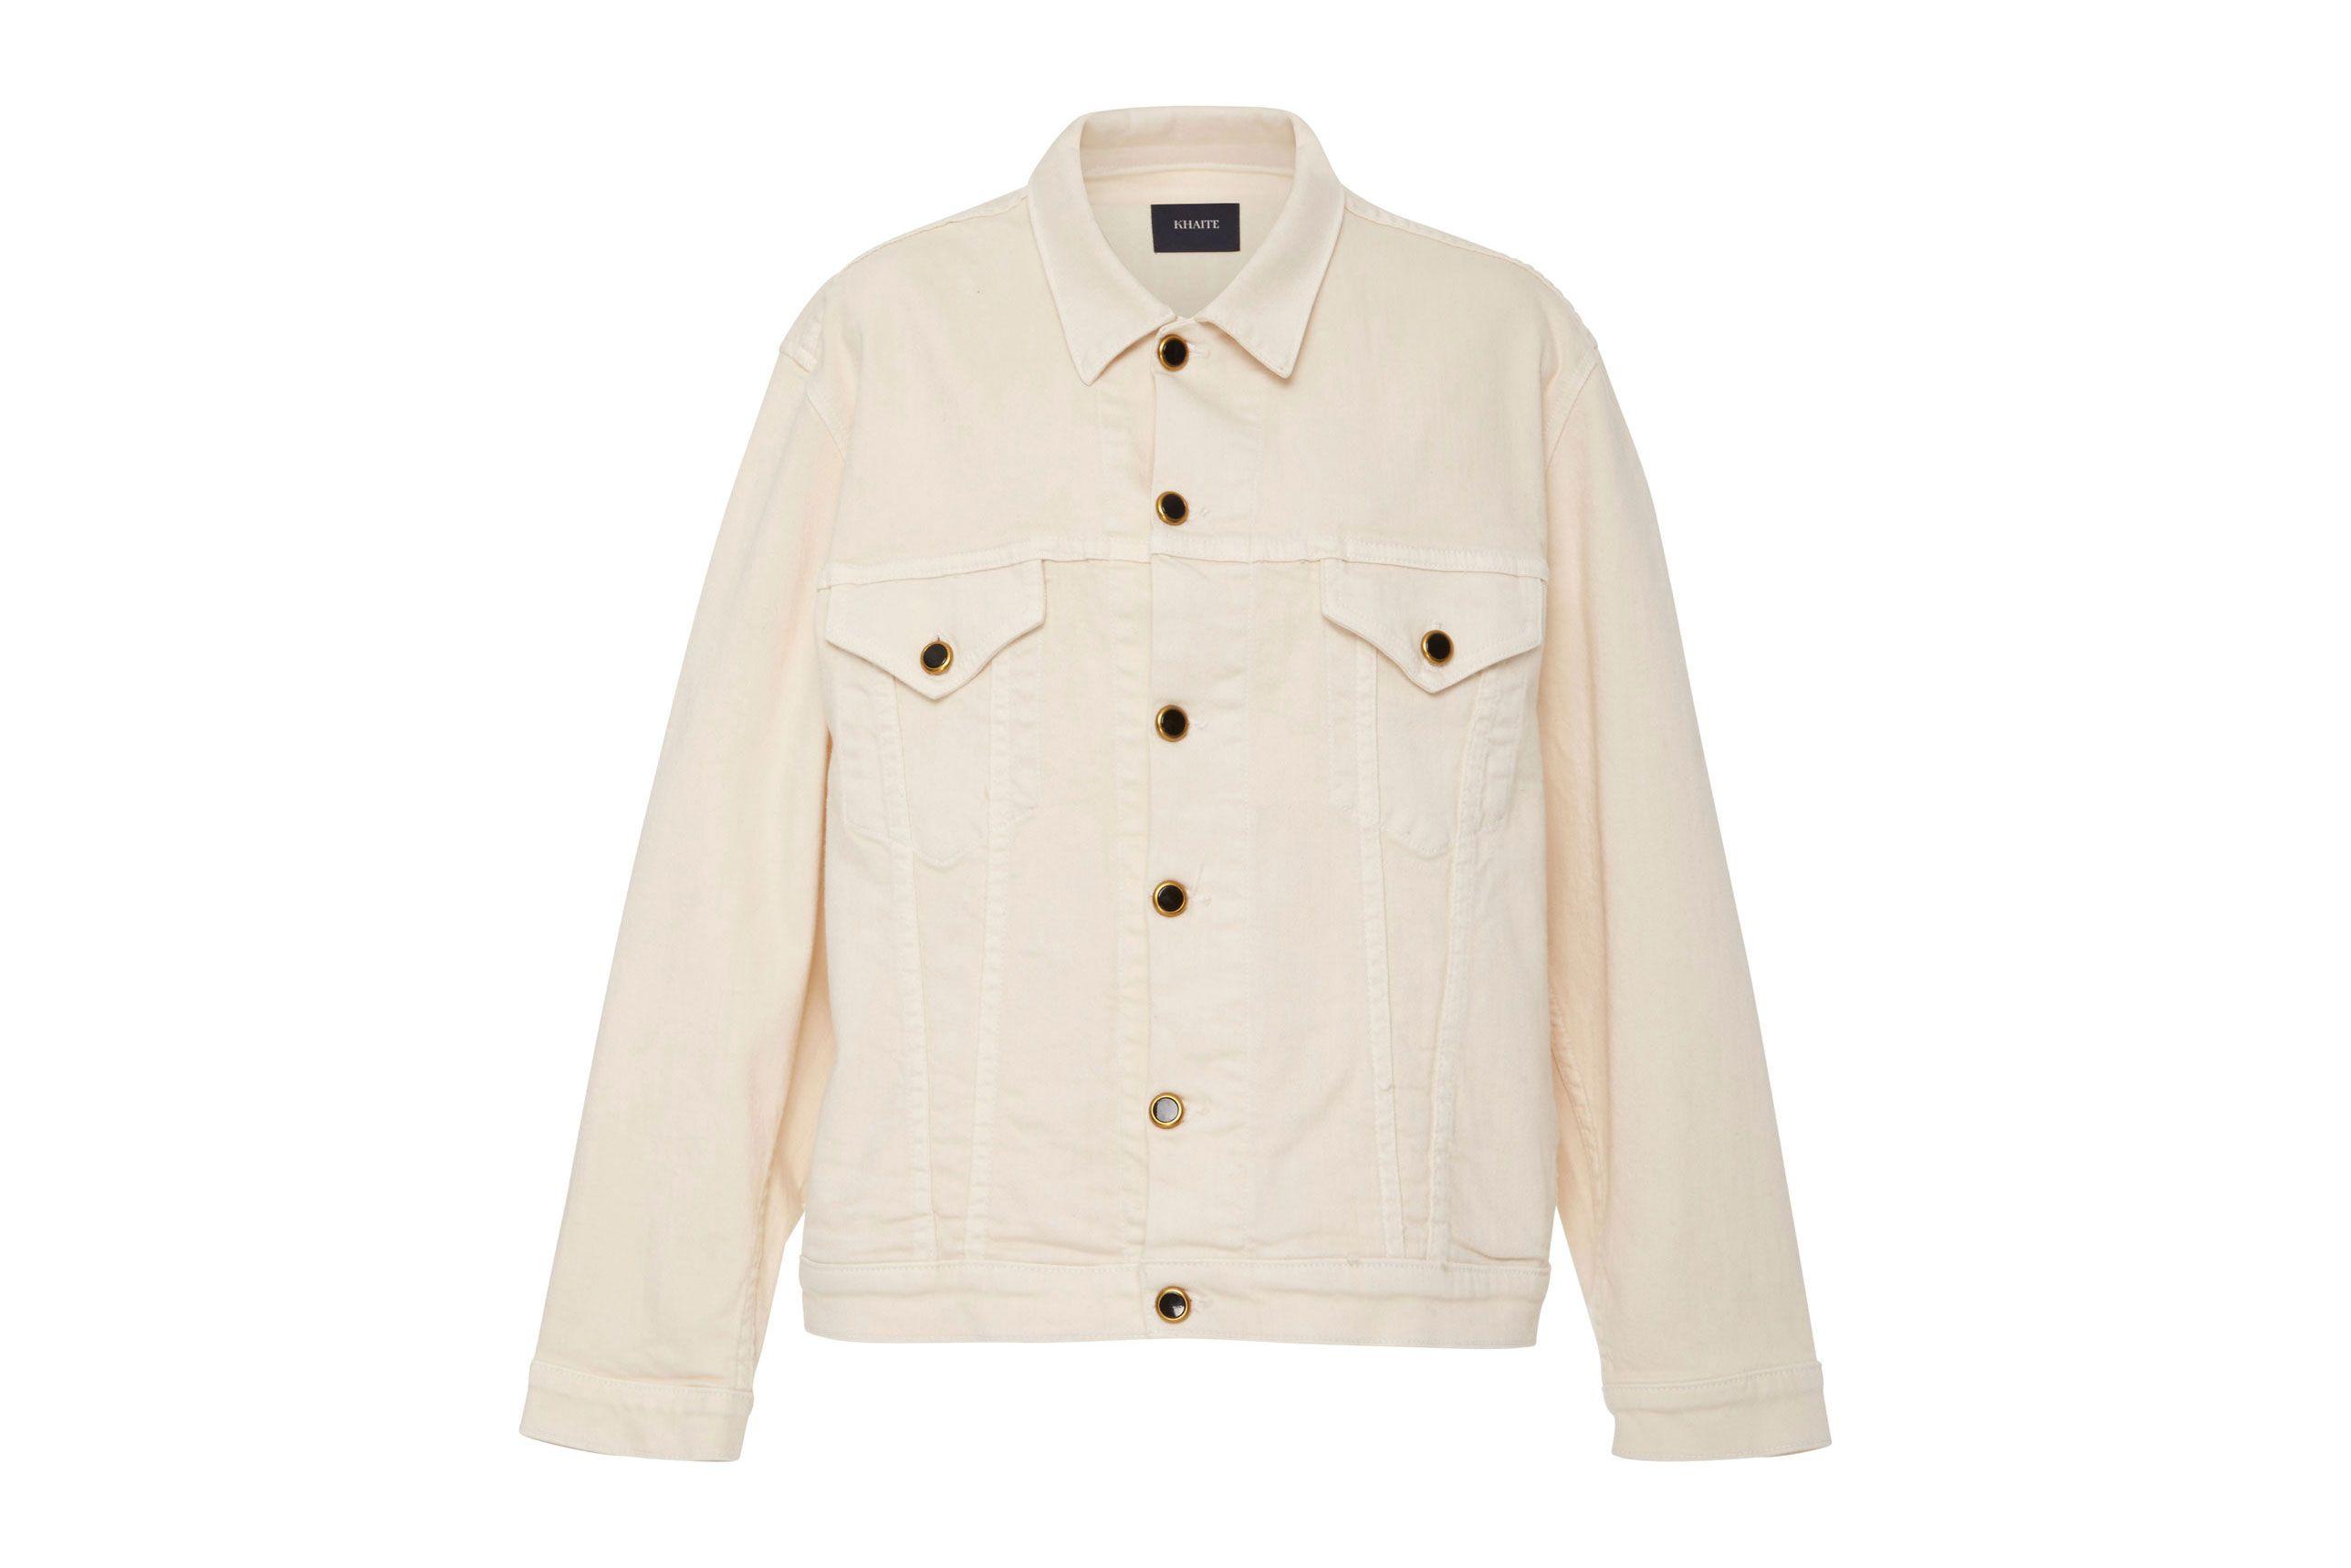 Khaite Cate Ivory Denim Jacket